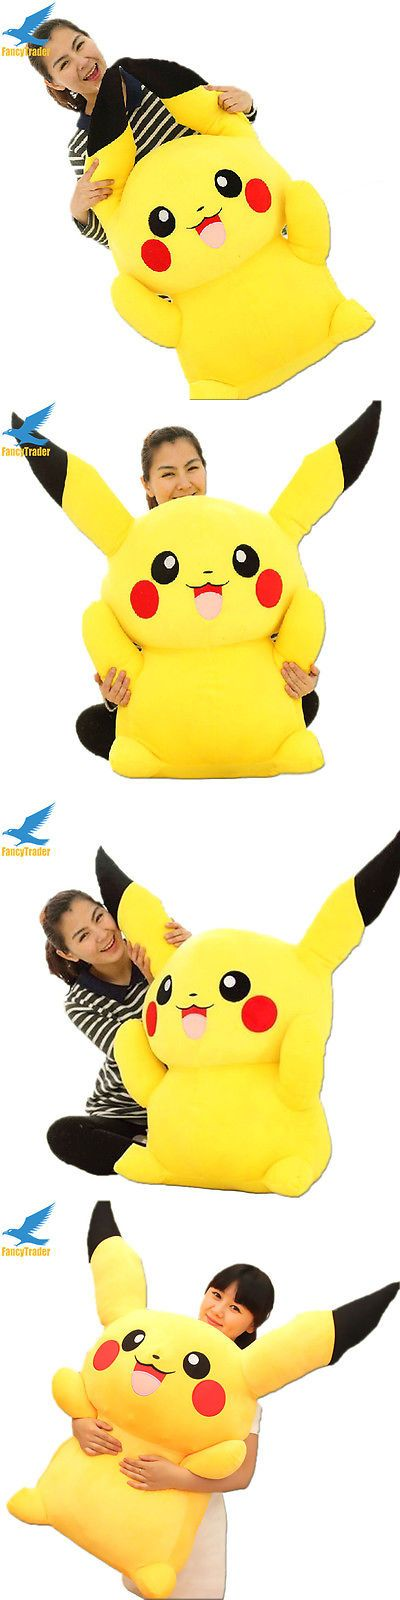 Stuffed Animals Beanbag Plush 51030: Giant Pikachu Plush Soft Toy Big Stuffed Filled Doll Huge Kid Best Birthday Gift -> BUY IT NOW ONLY: $88.88 on eBay!